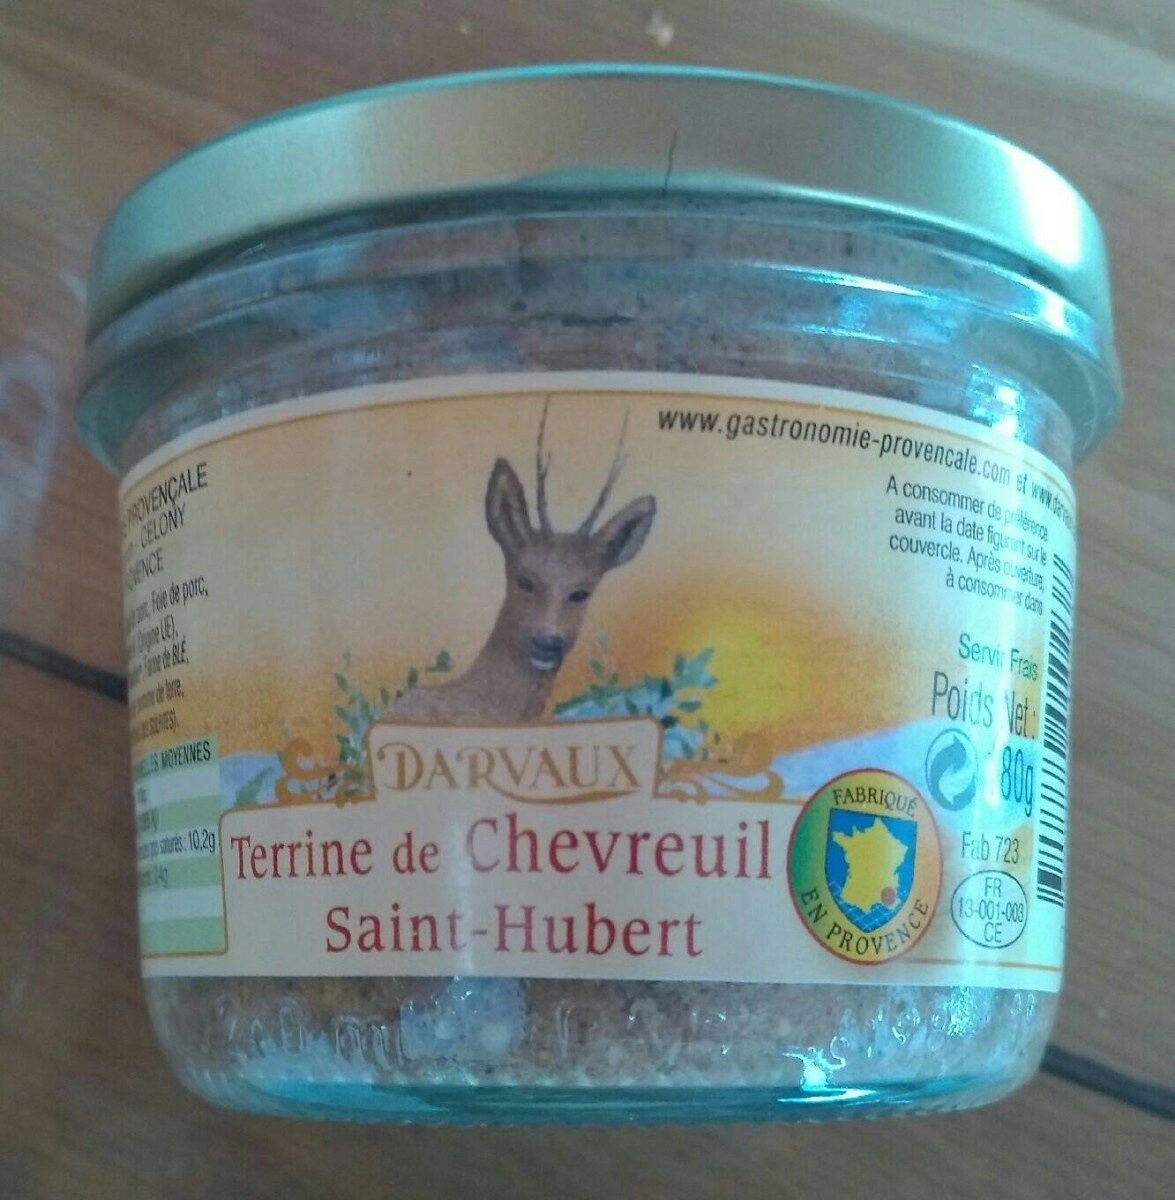 Terrine de chevreuil saint Hubert - Product - fr